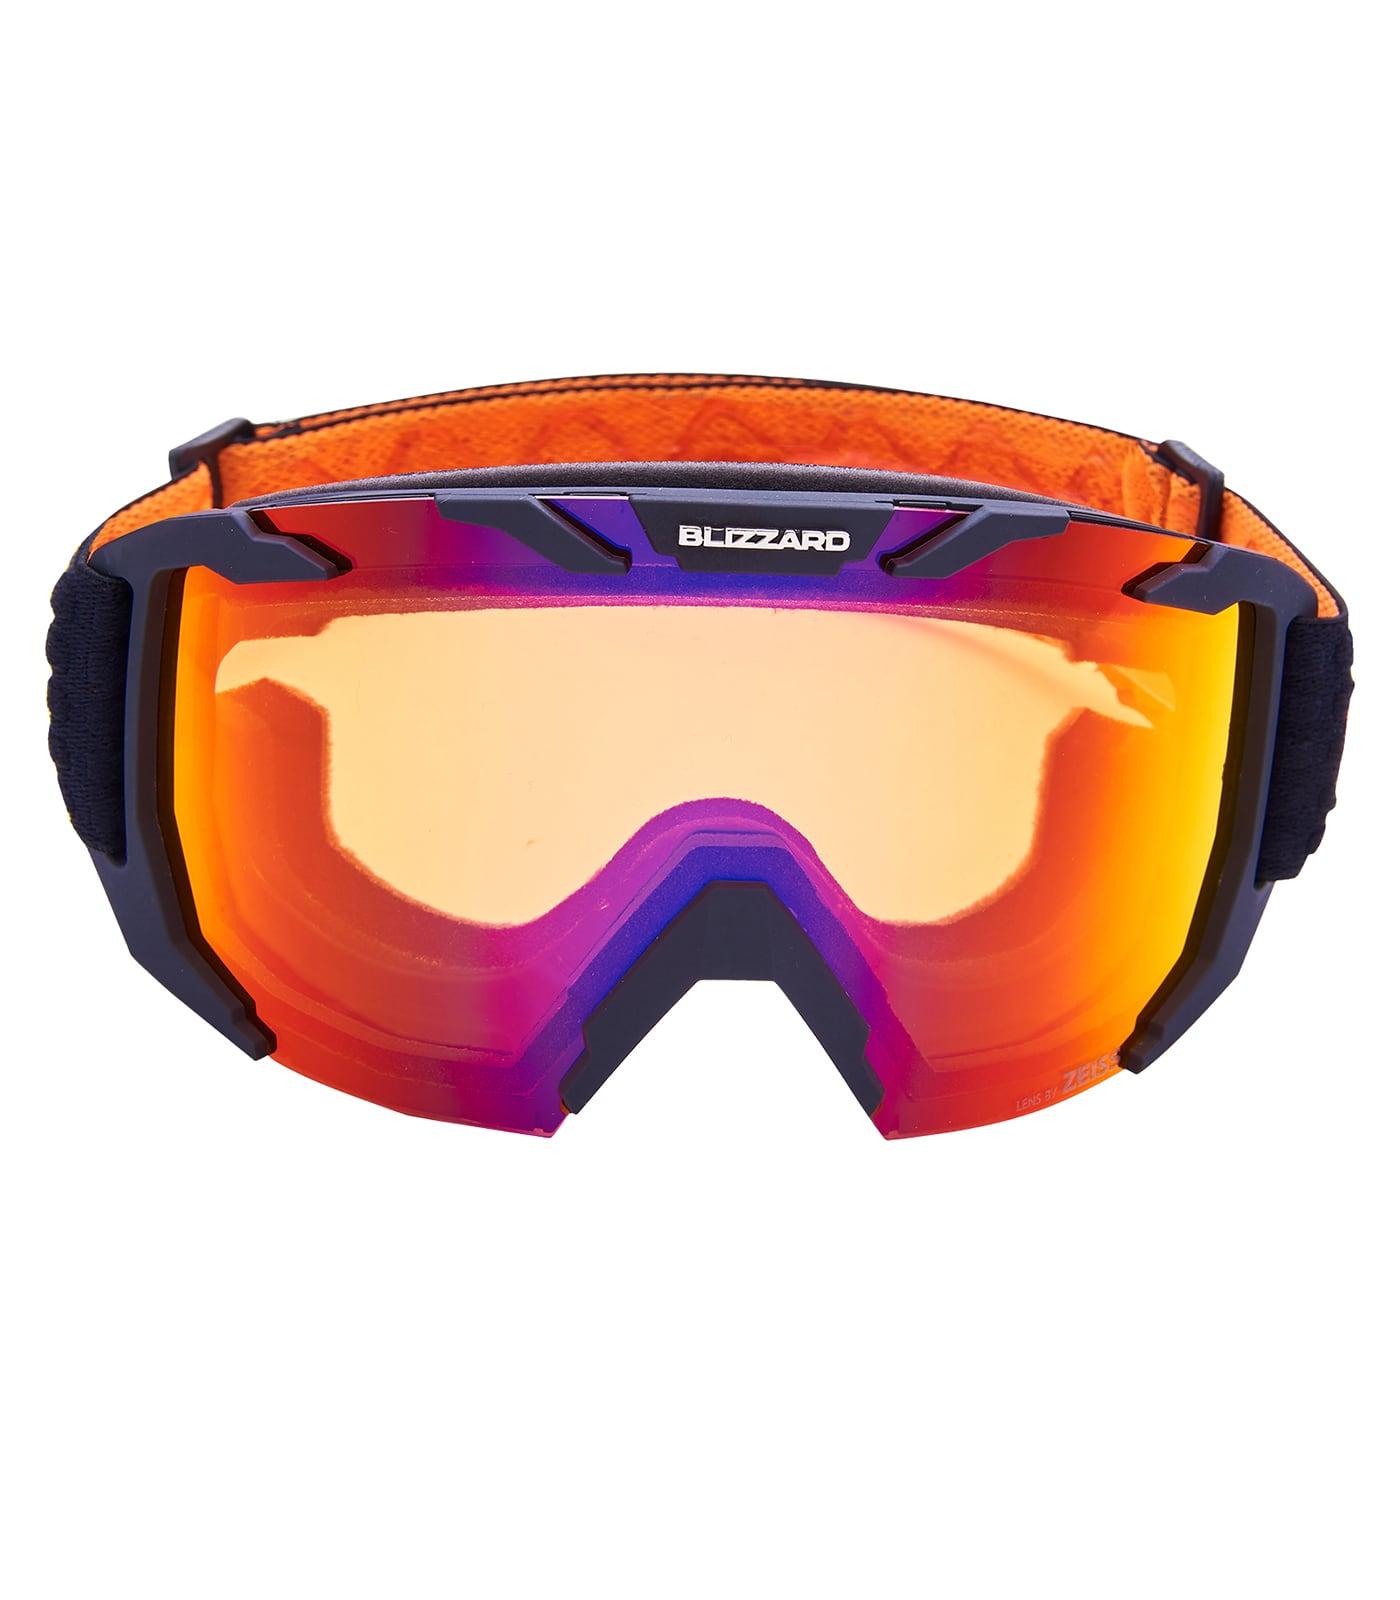 BLIZ Ski Gog. 925 MDAZWO, black matt, orange1, infrared REVO SONAR